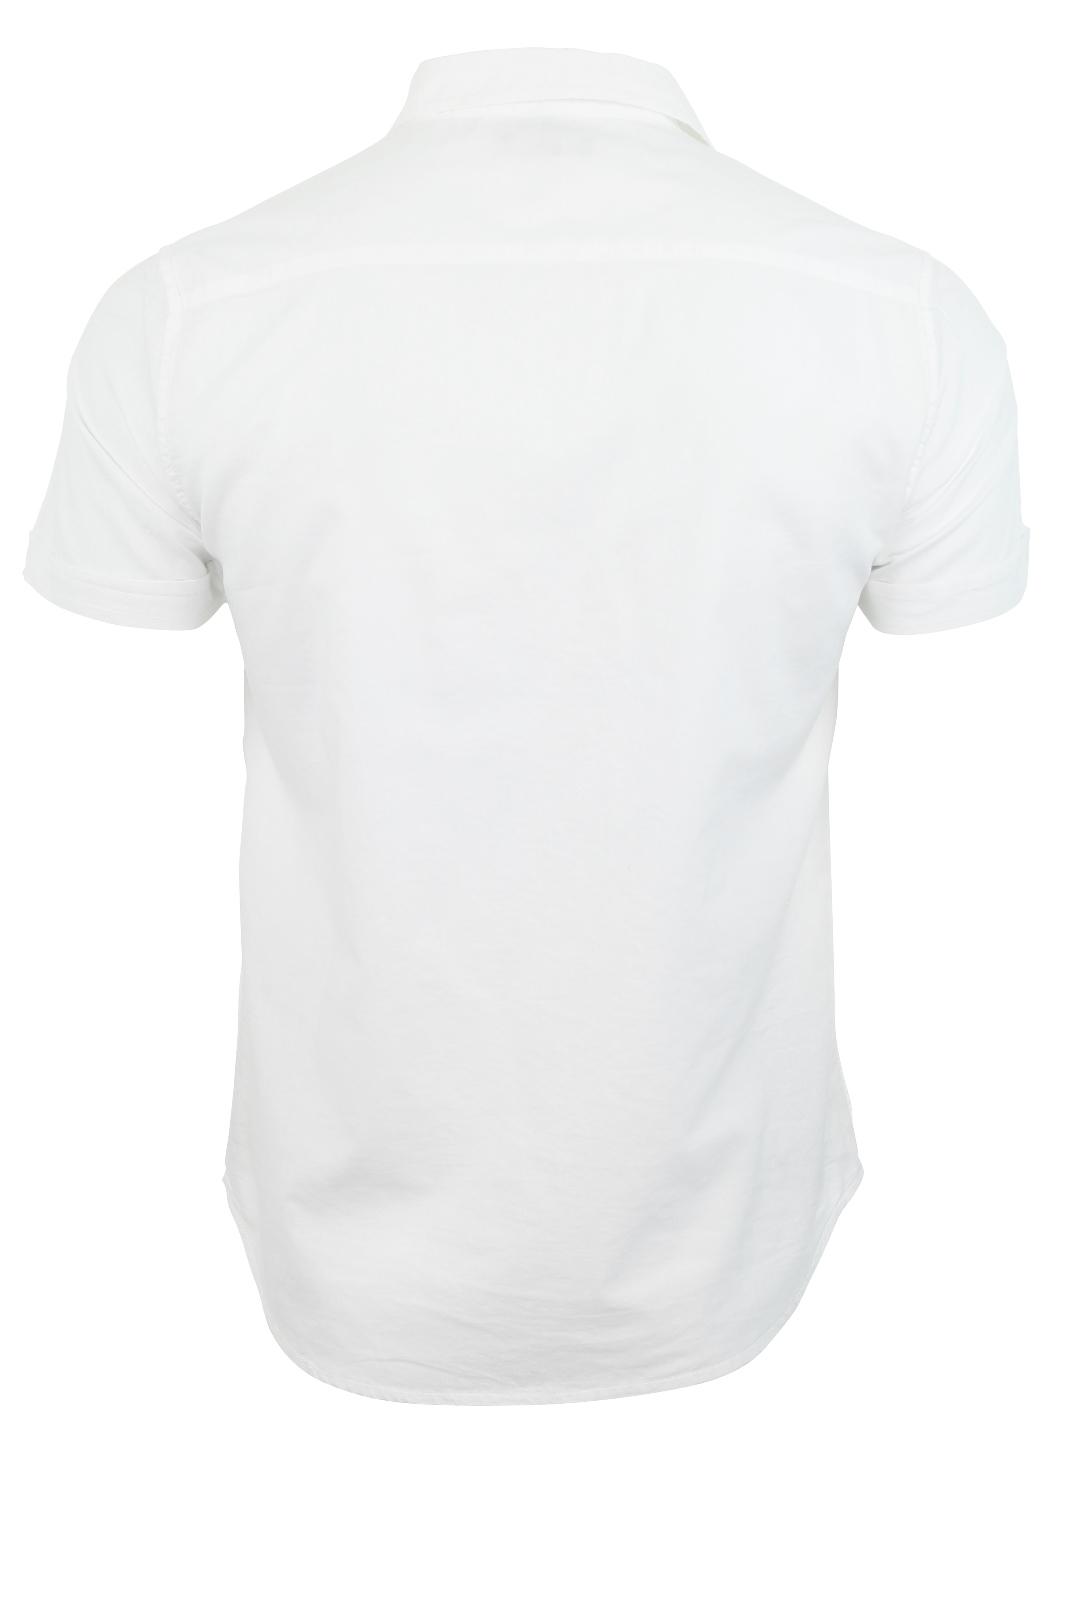 Camisa-De-Hombre-Brave-Soul-Manga-Corta-034-Platon-034-Doble-Bolsillo-De-Pecho